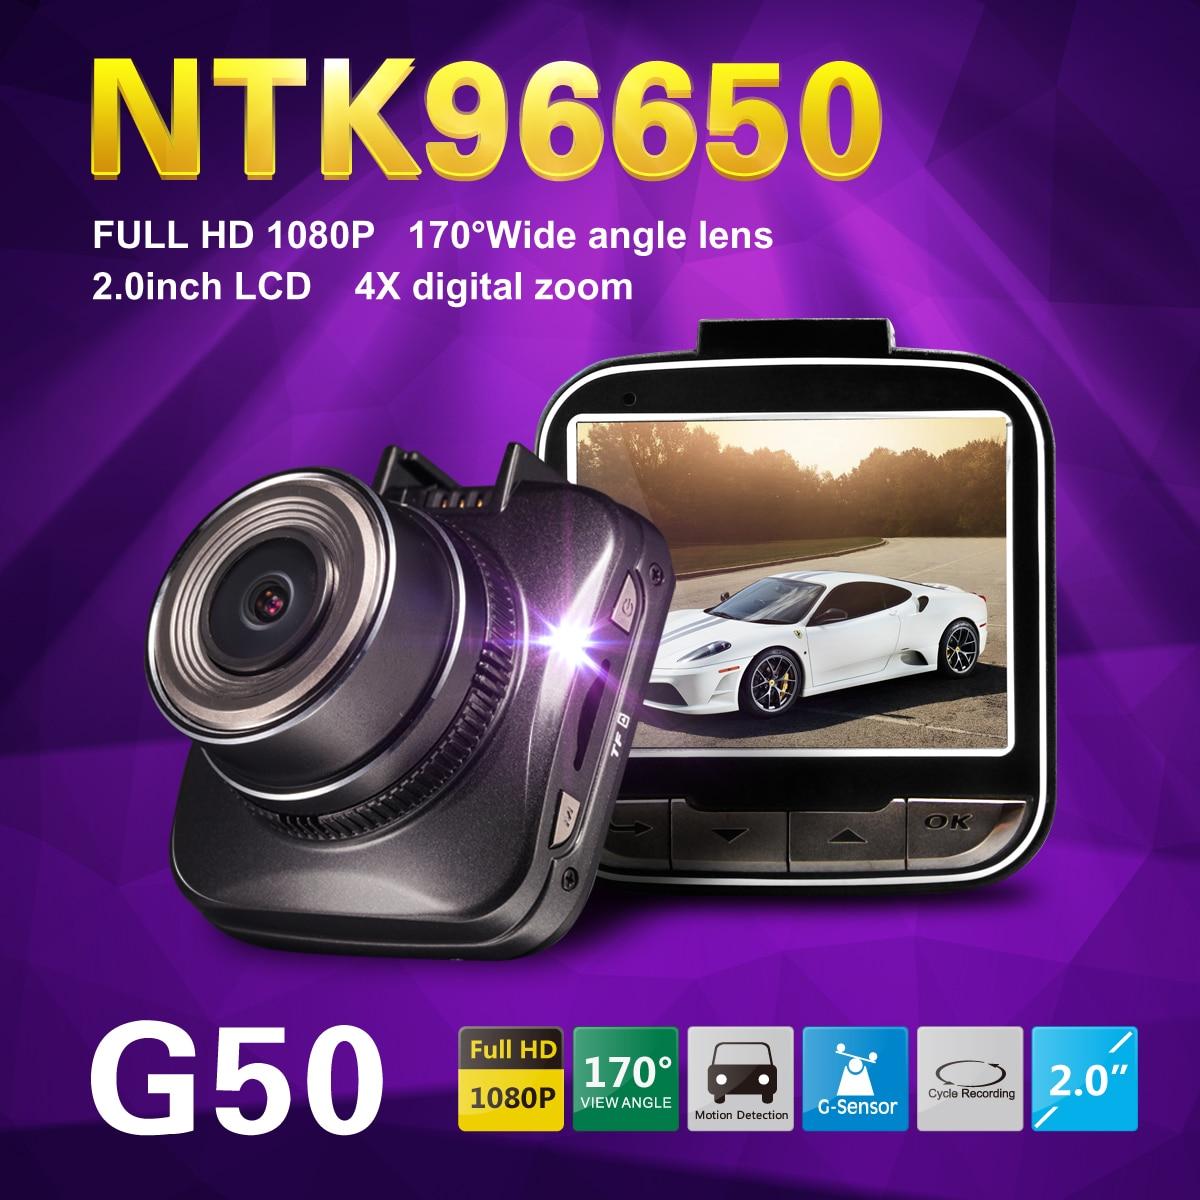 Mini Car DVR Novatek 96650 G50 Full HD 1080P Video Registrator Recorder 2.0LCD Dash Cam H.264 WDR G-Sensor Car Camera 8267 1080p full hd car dvr lcd hdmi camera video recorder dash cam g sensor